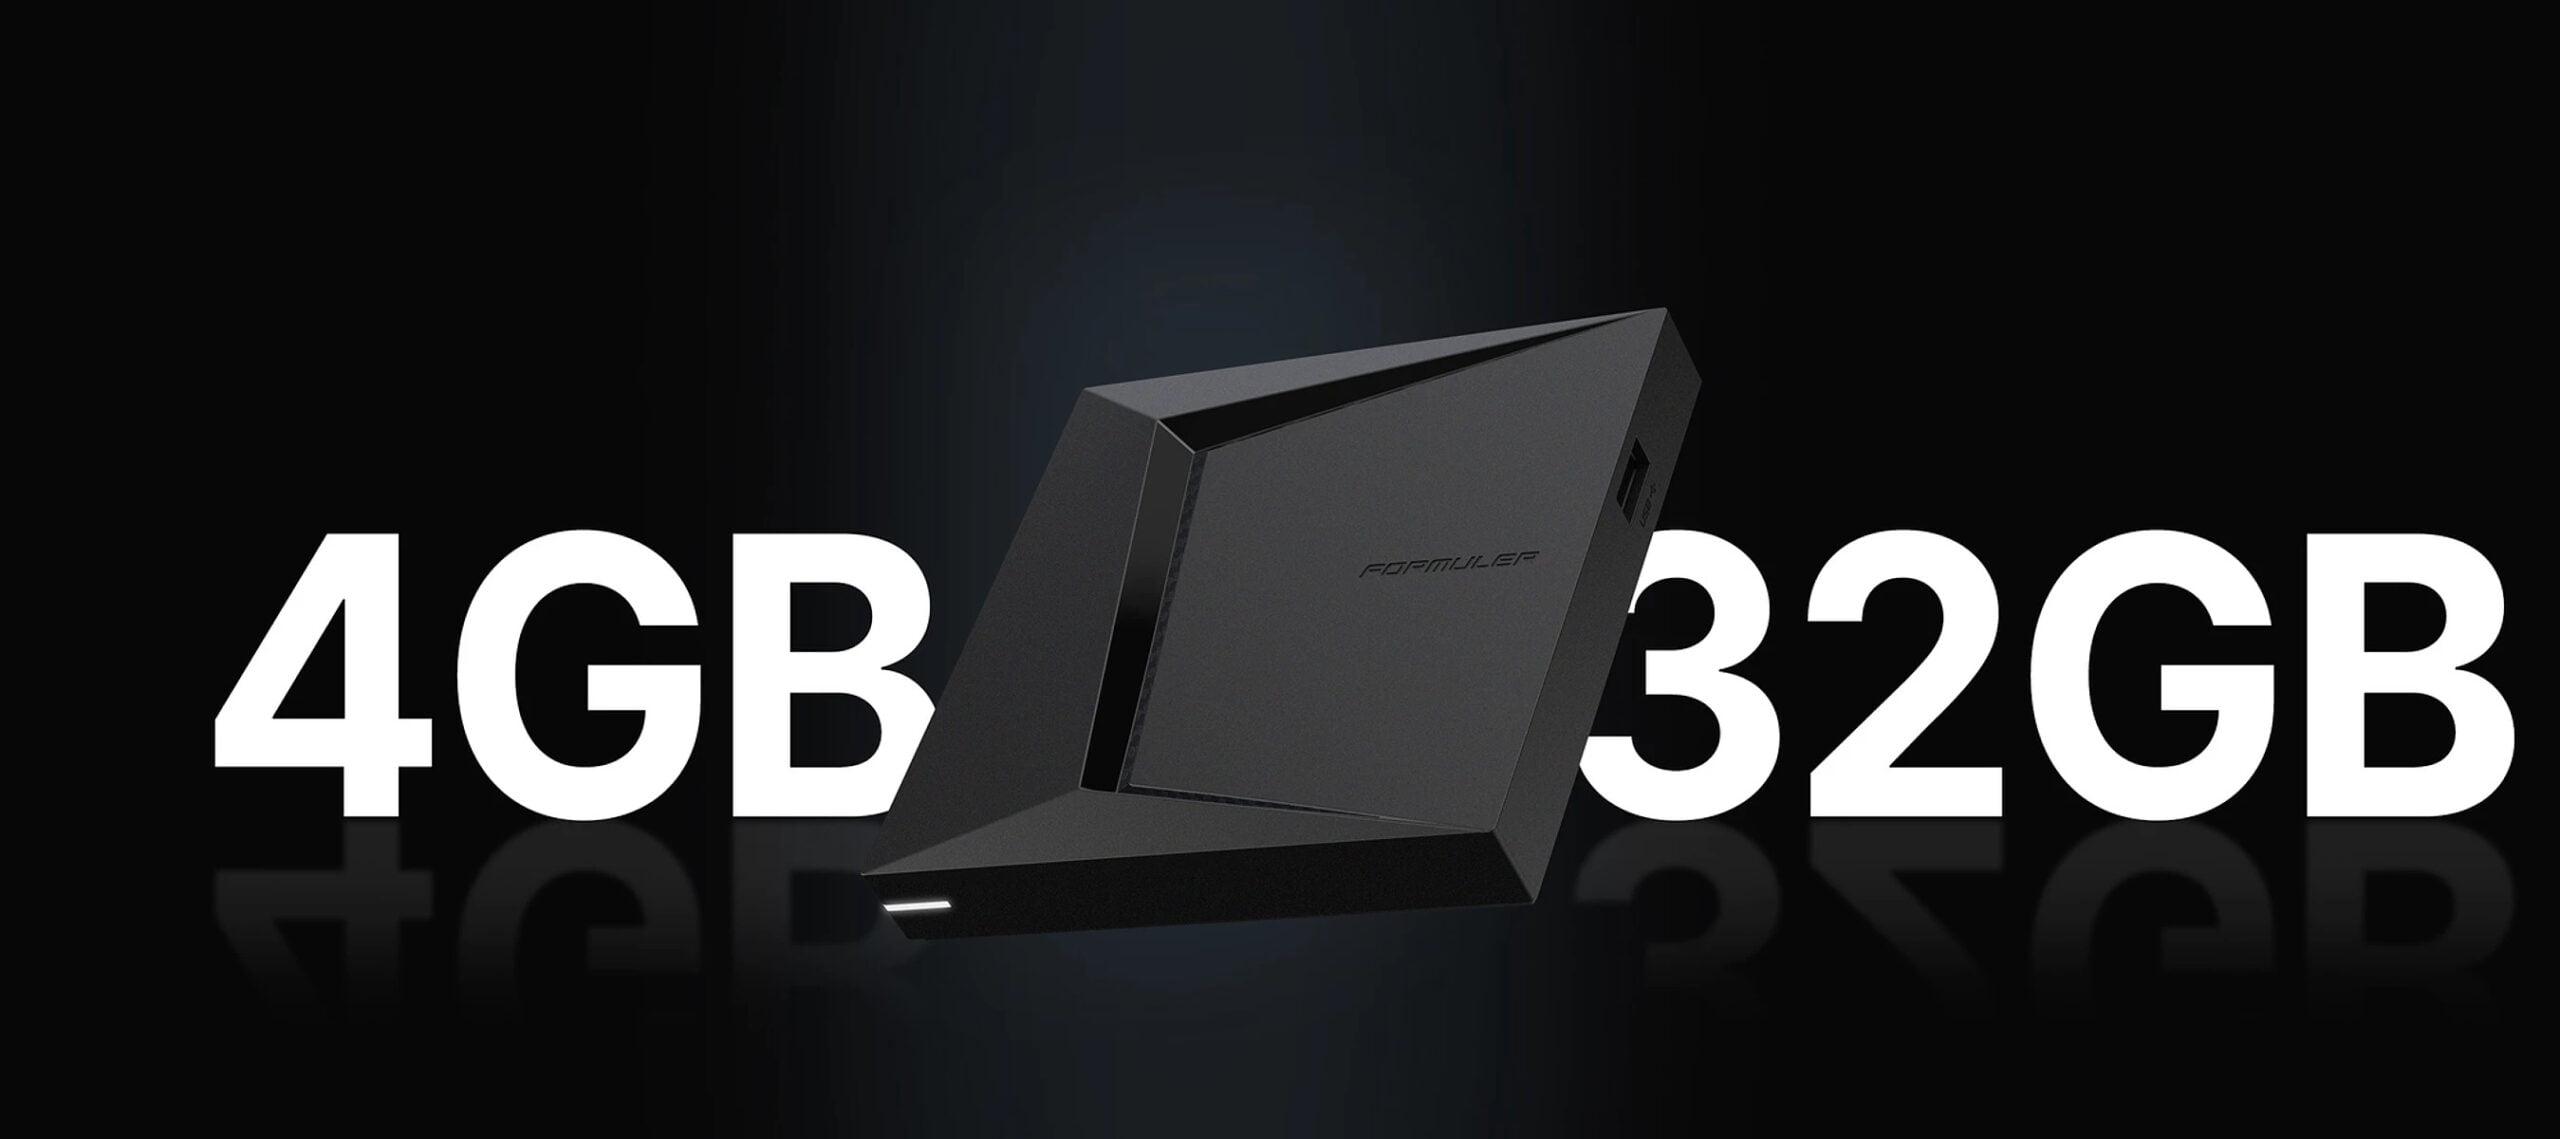 Formuler Z10 Pro Max 4GB 32GB